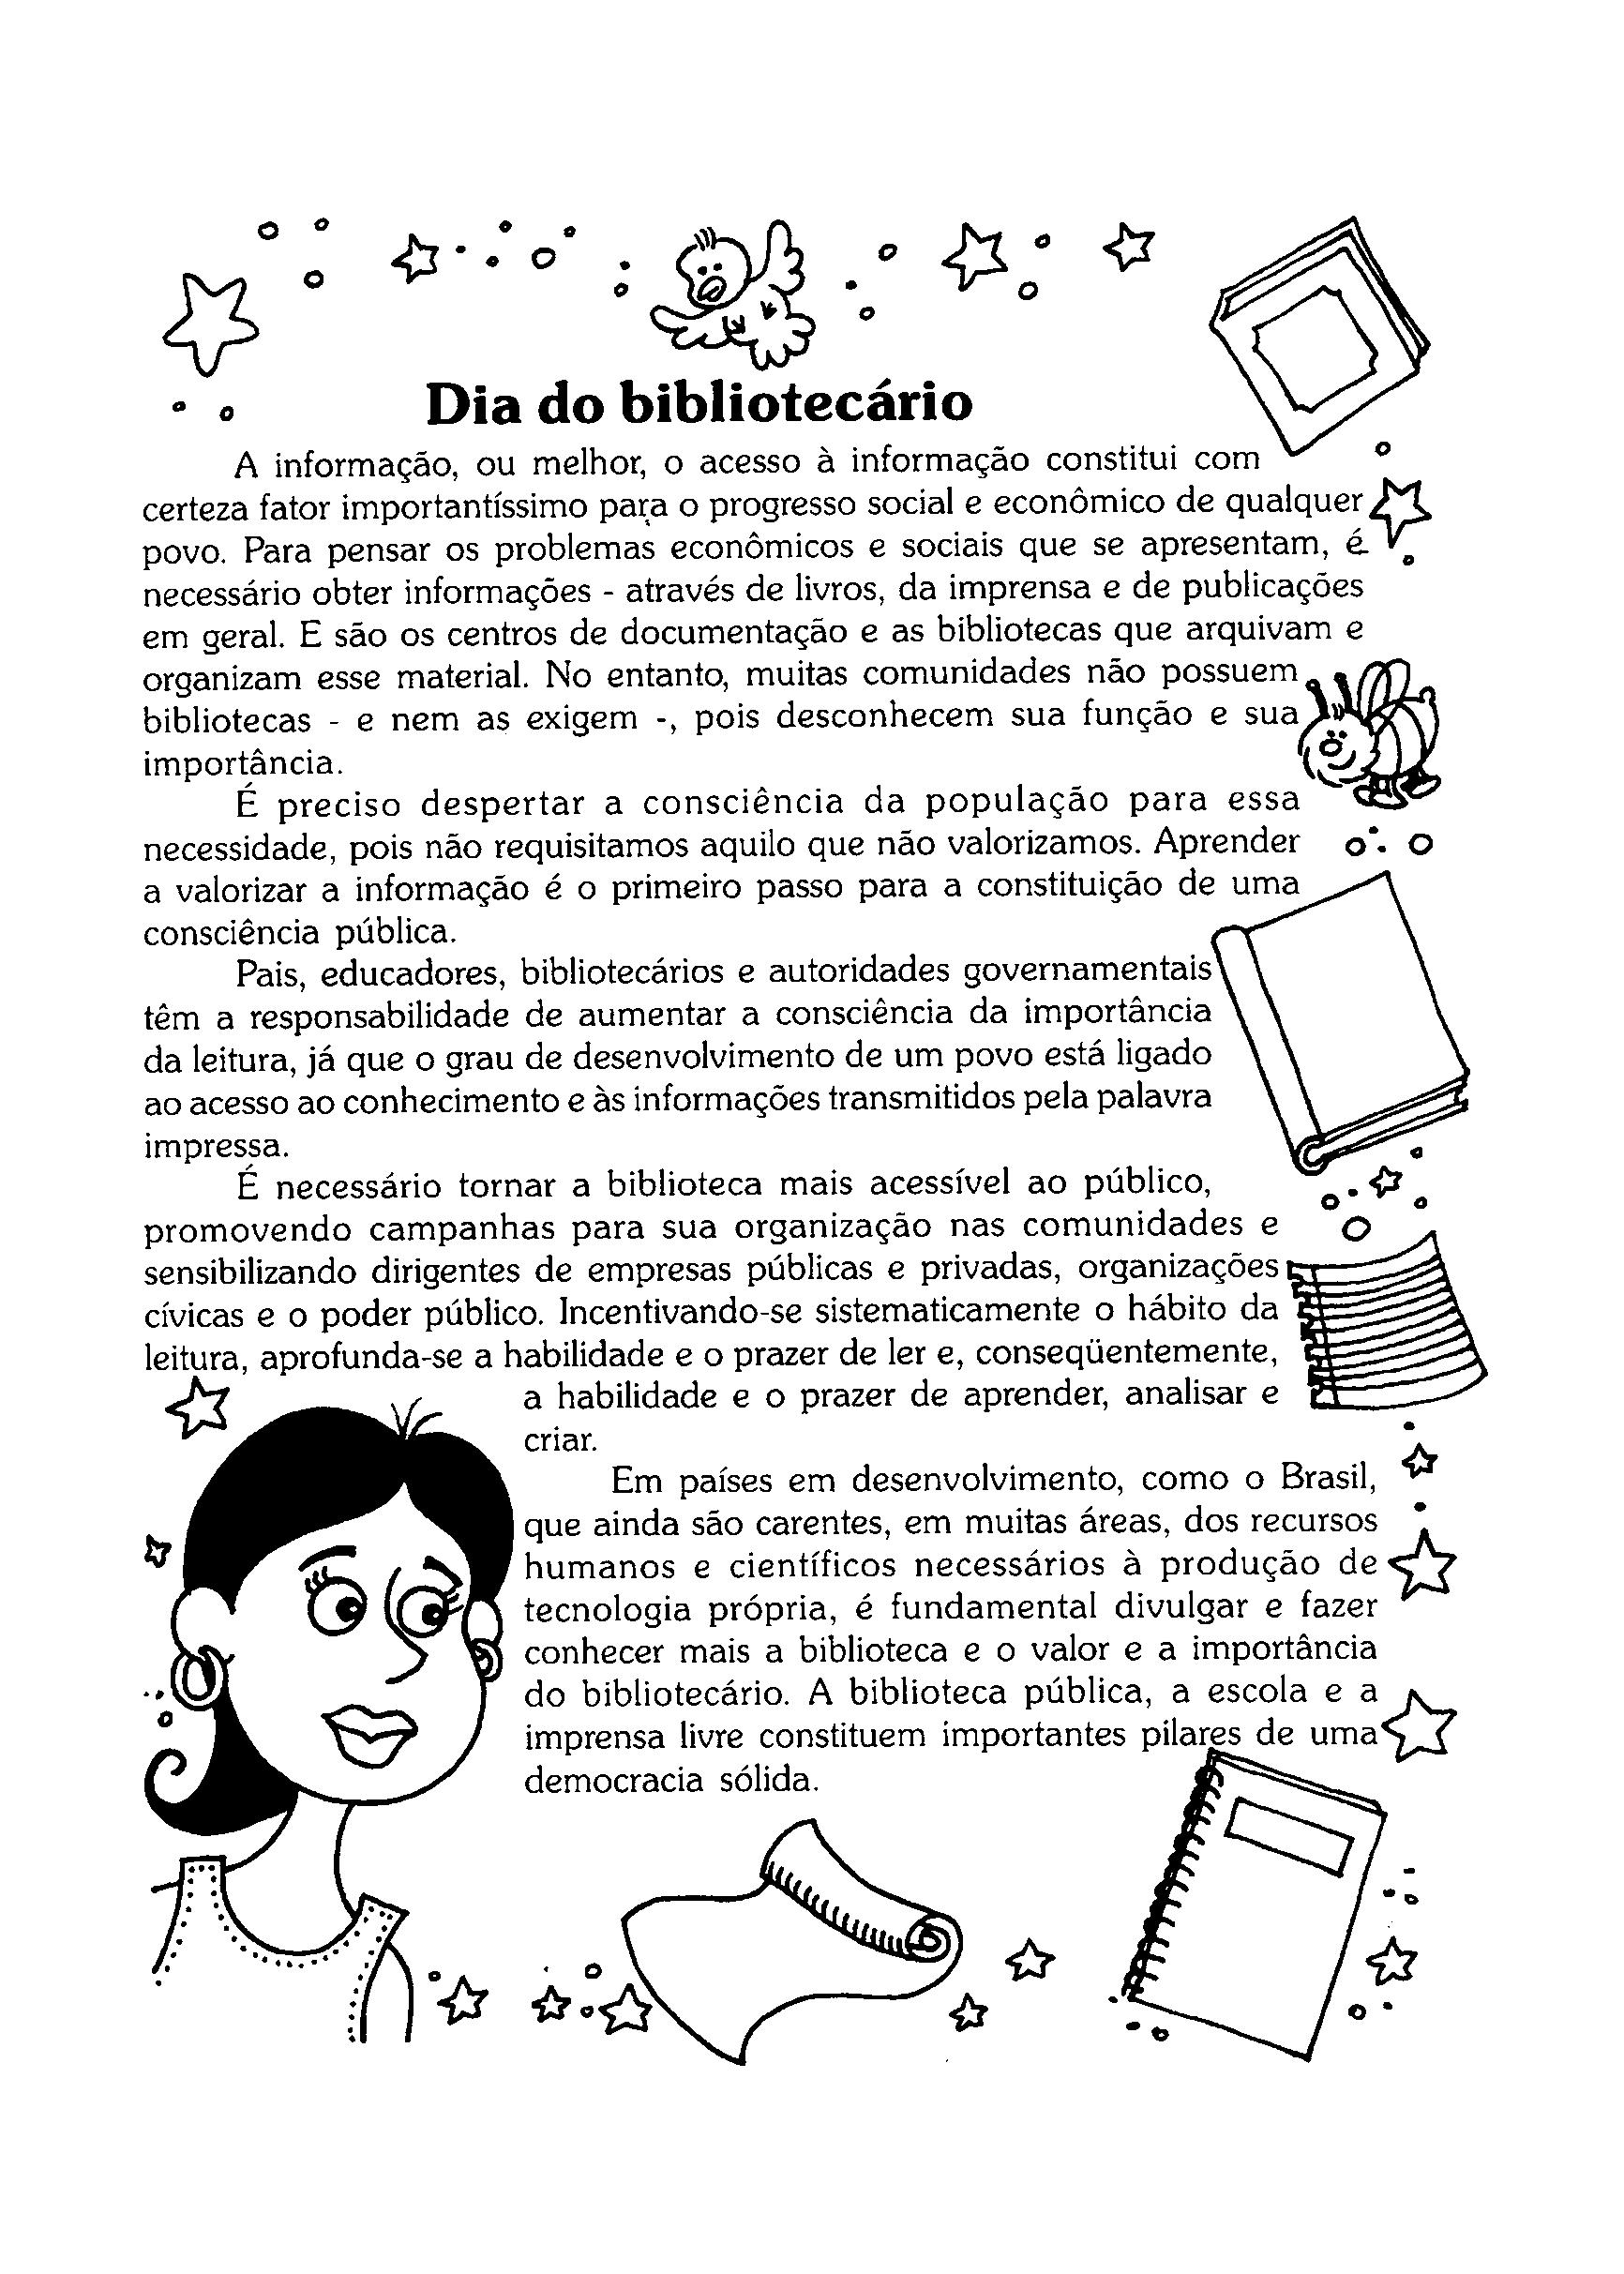 datas-marco-texto-bibliotecario